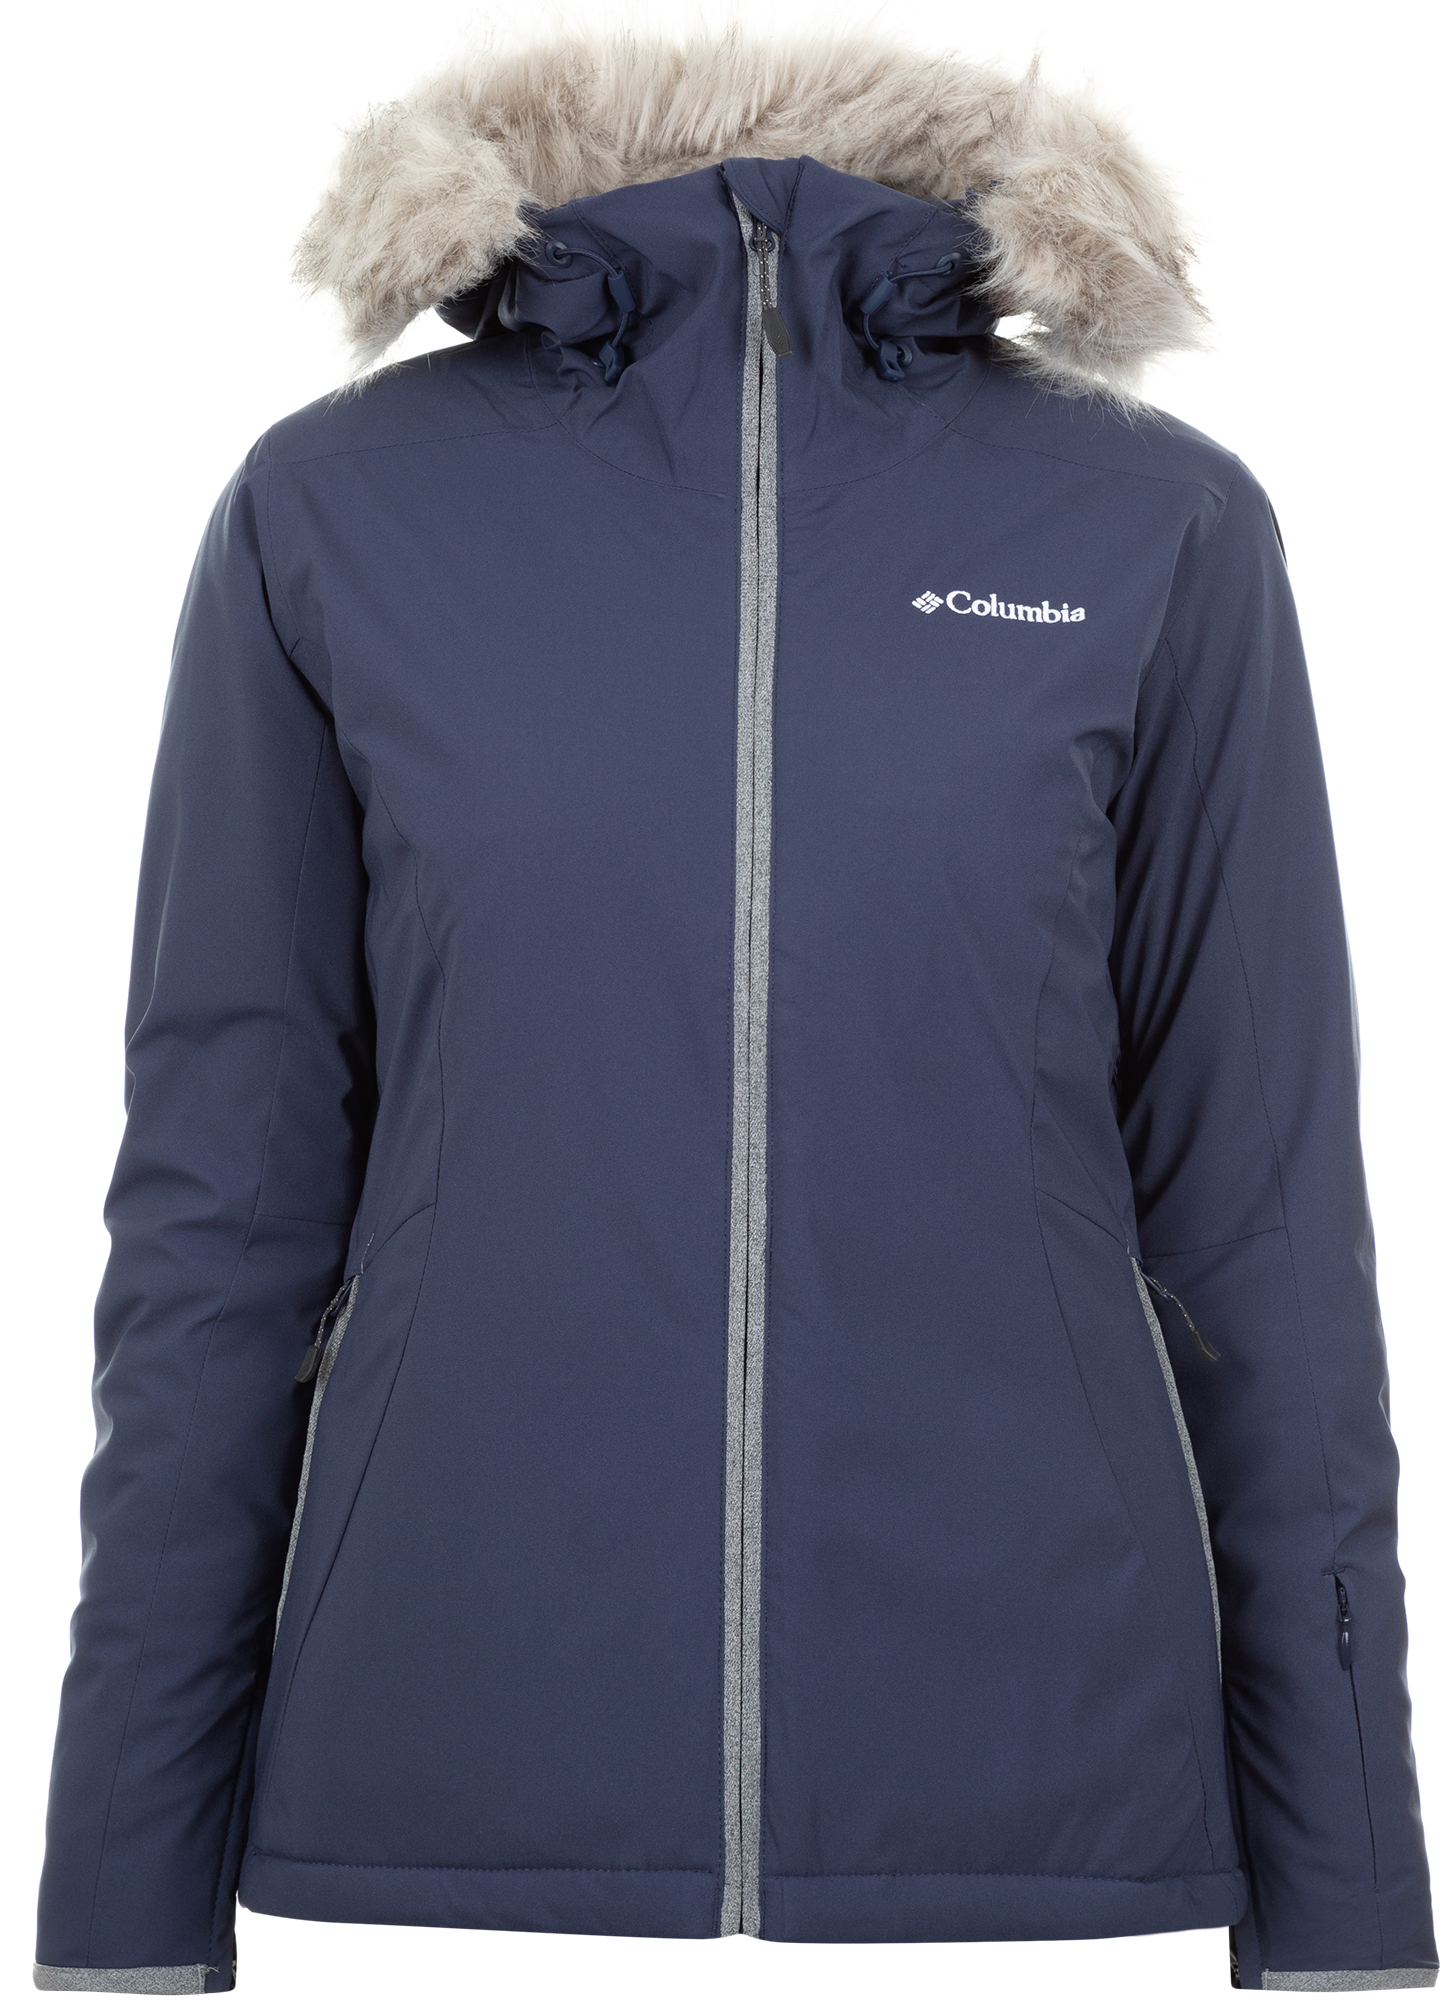 Columbia Куртка утепленная женская Columbia Alpine Slide, размер 46 цена и фото